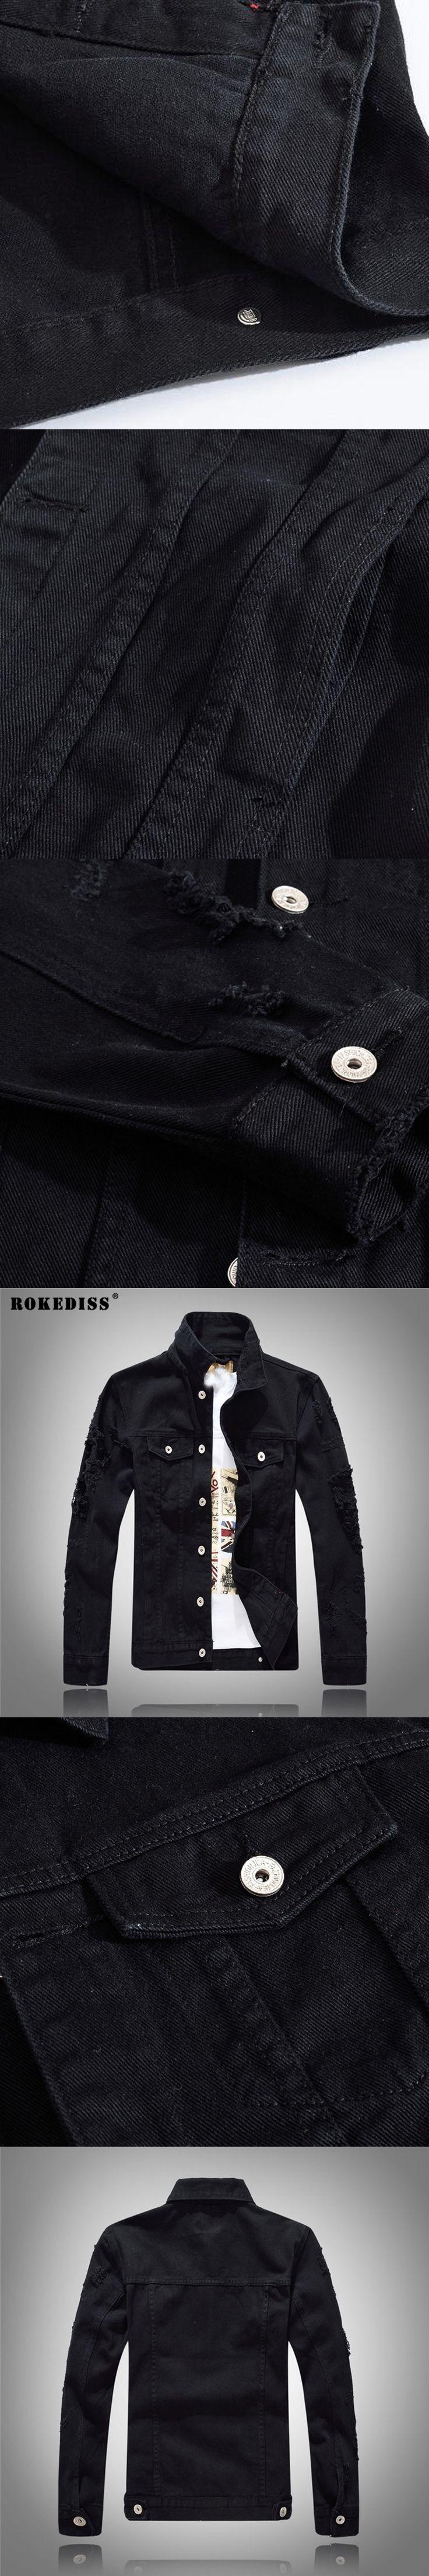 ROKEDISS 2017 New Fashion Casual Men's Denim Jacket Outwear Long Sleeve Men's Jacket Coats Slim Fit Style Holes W073